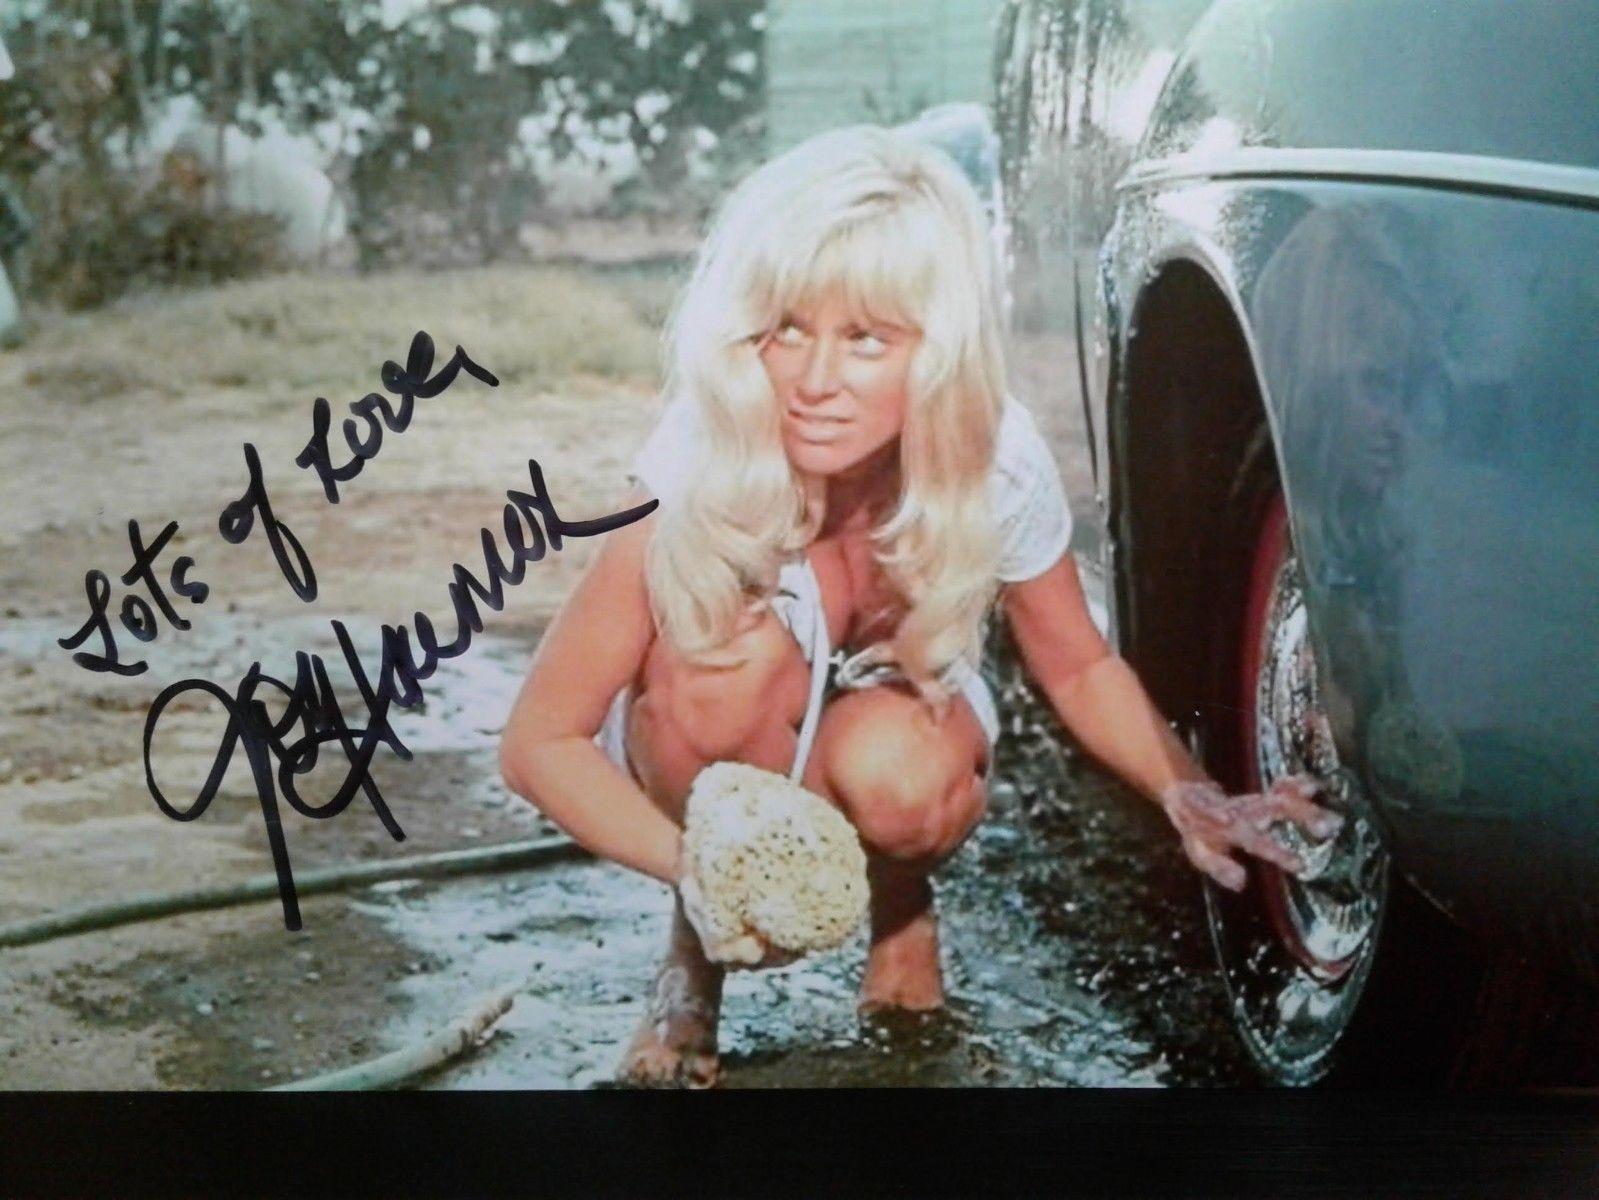 Joy Harmon auténtico autógrafo 4X6 foto firmada a mano